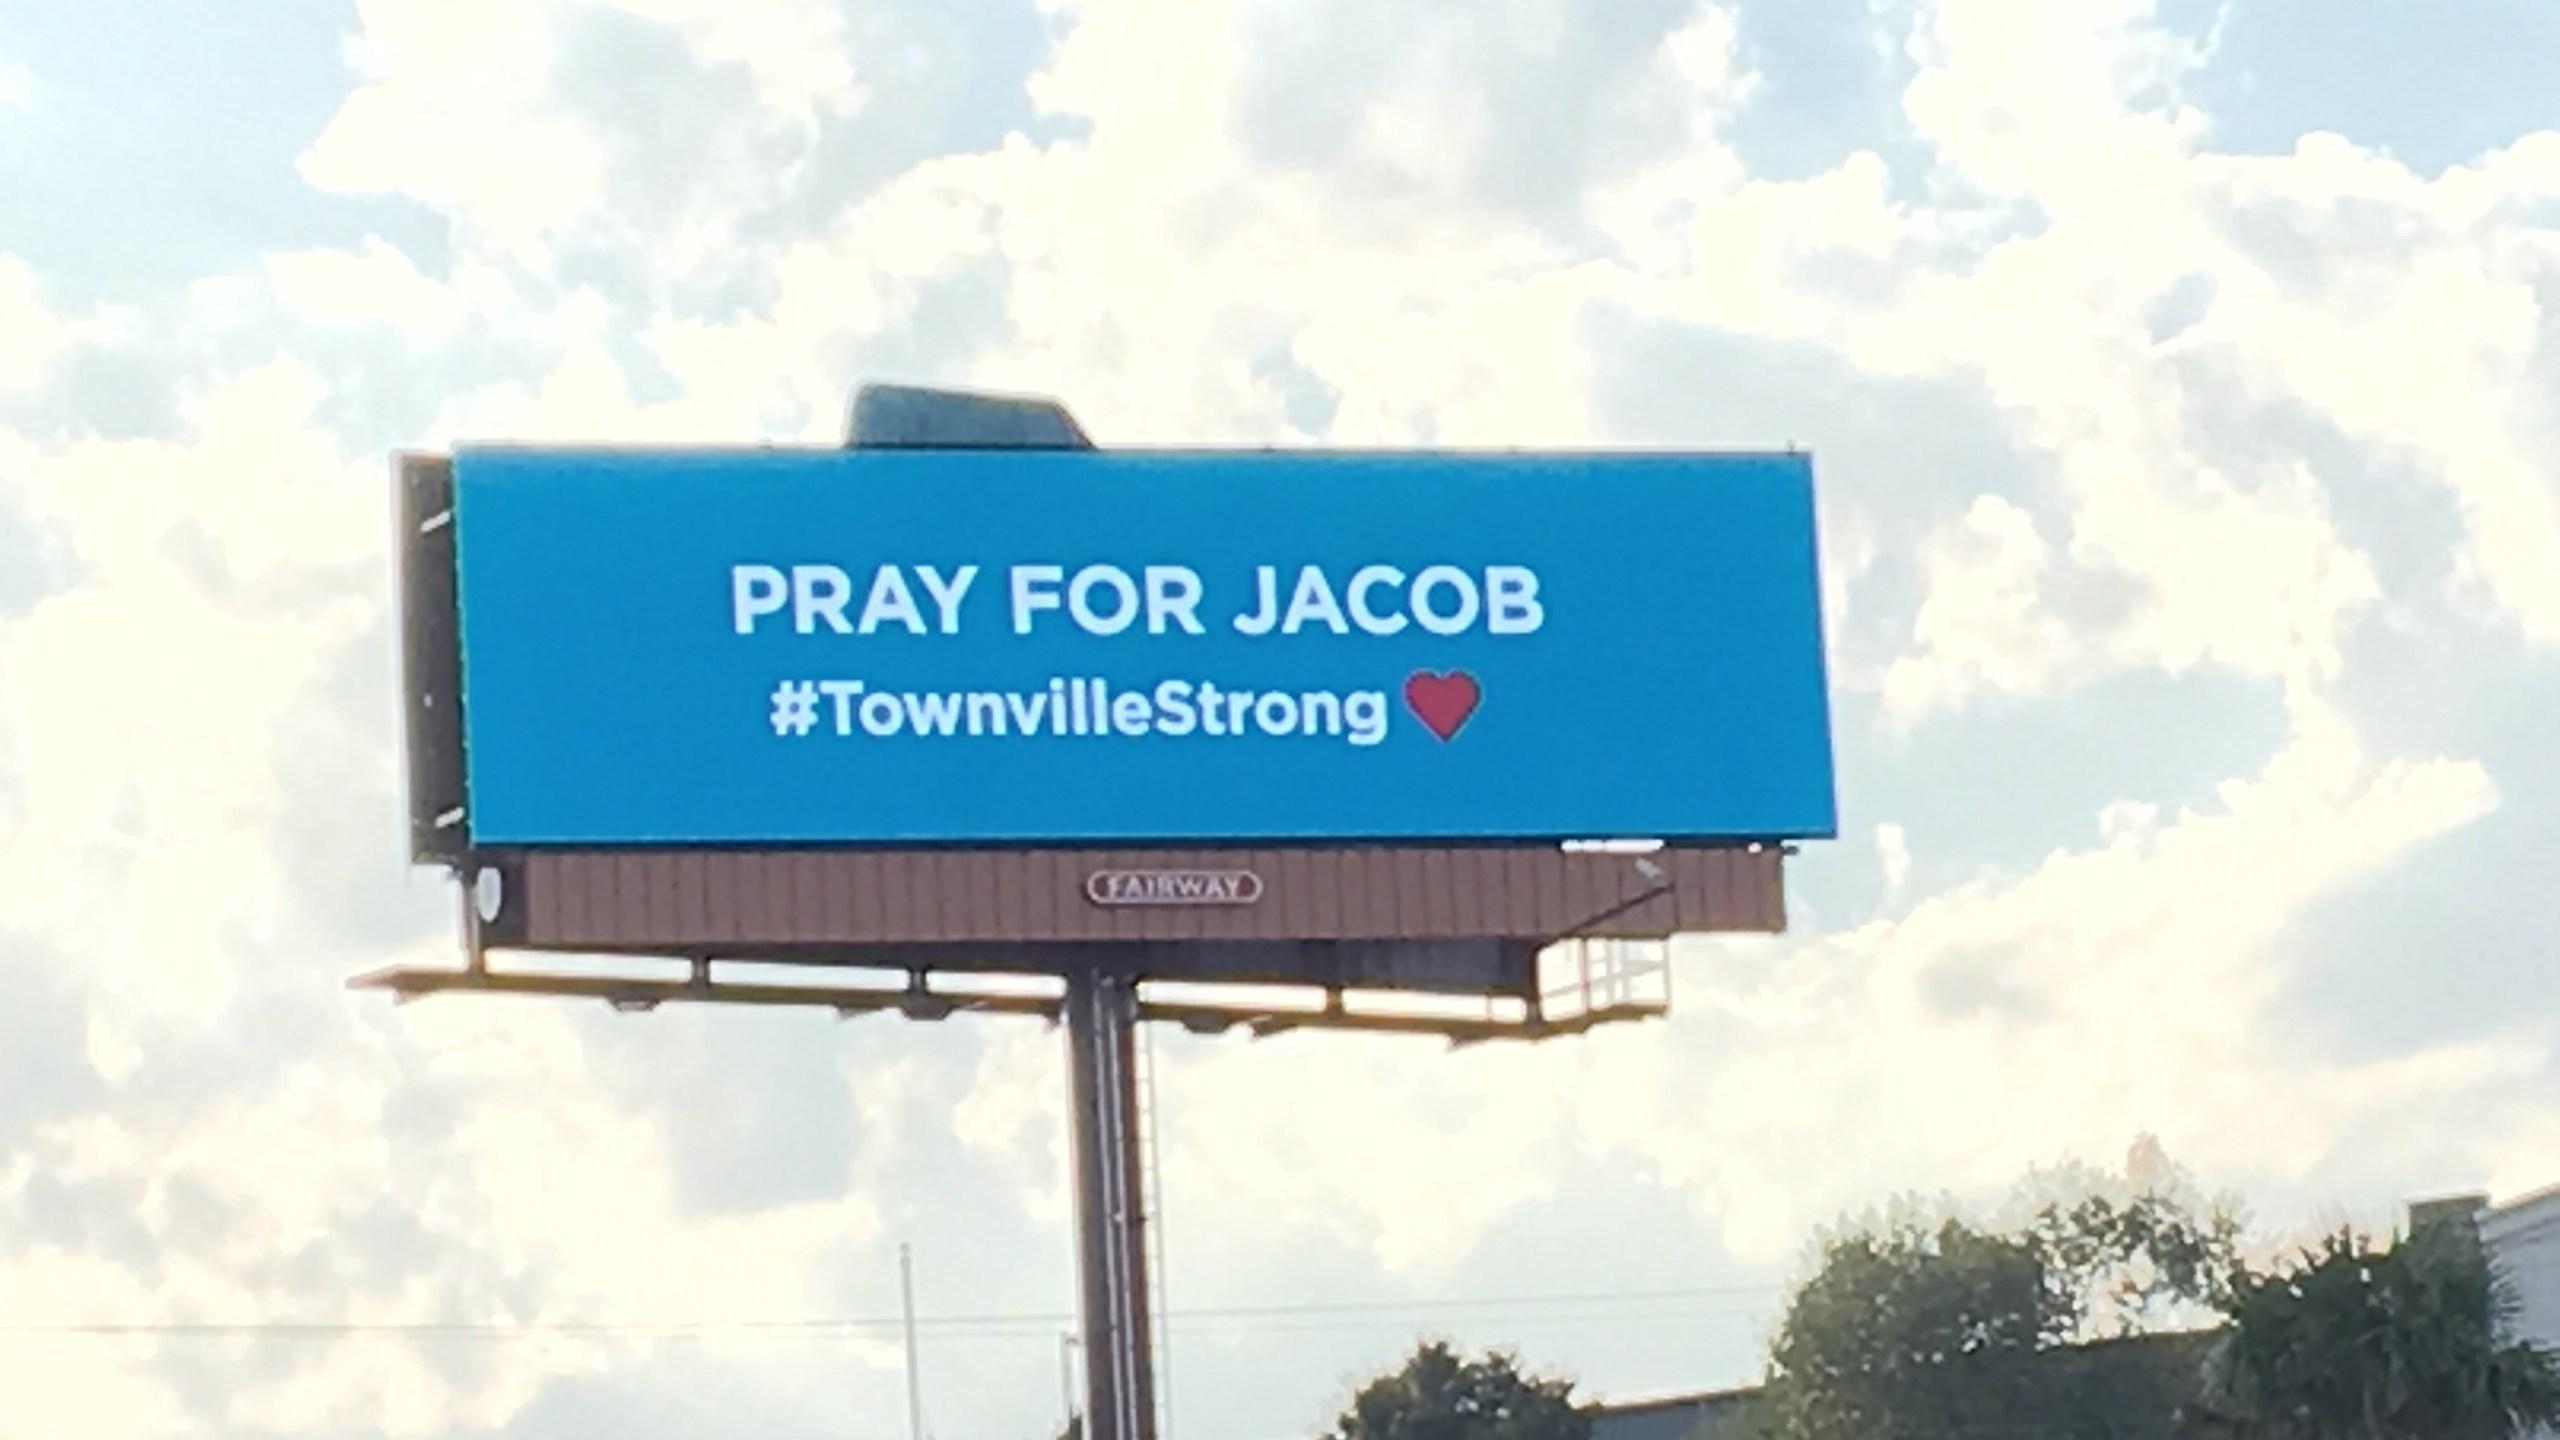 Pray for Jacob billboard_251848